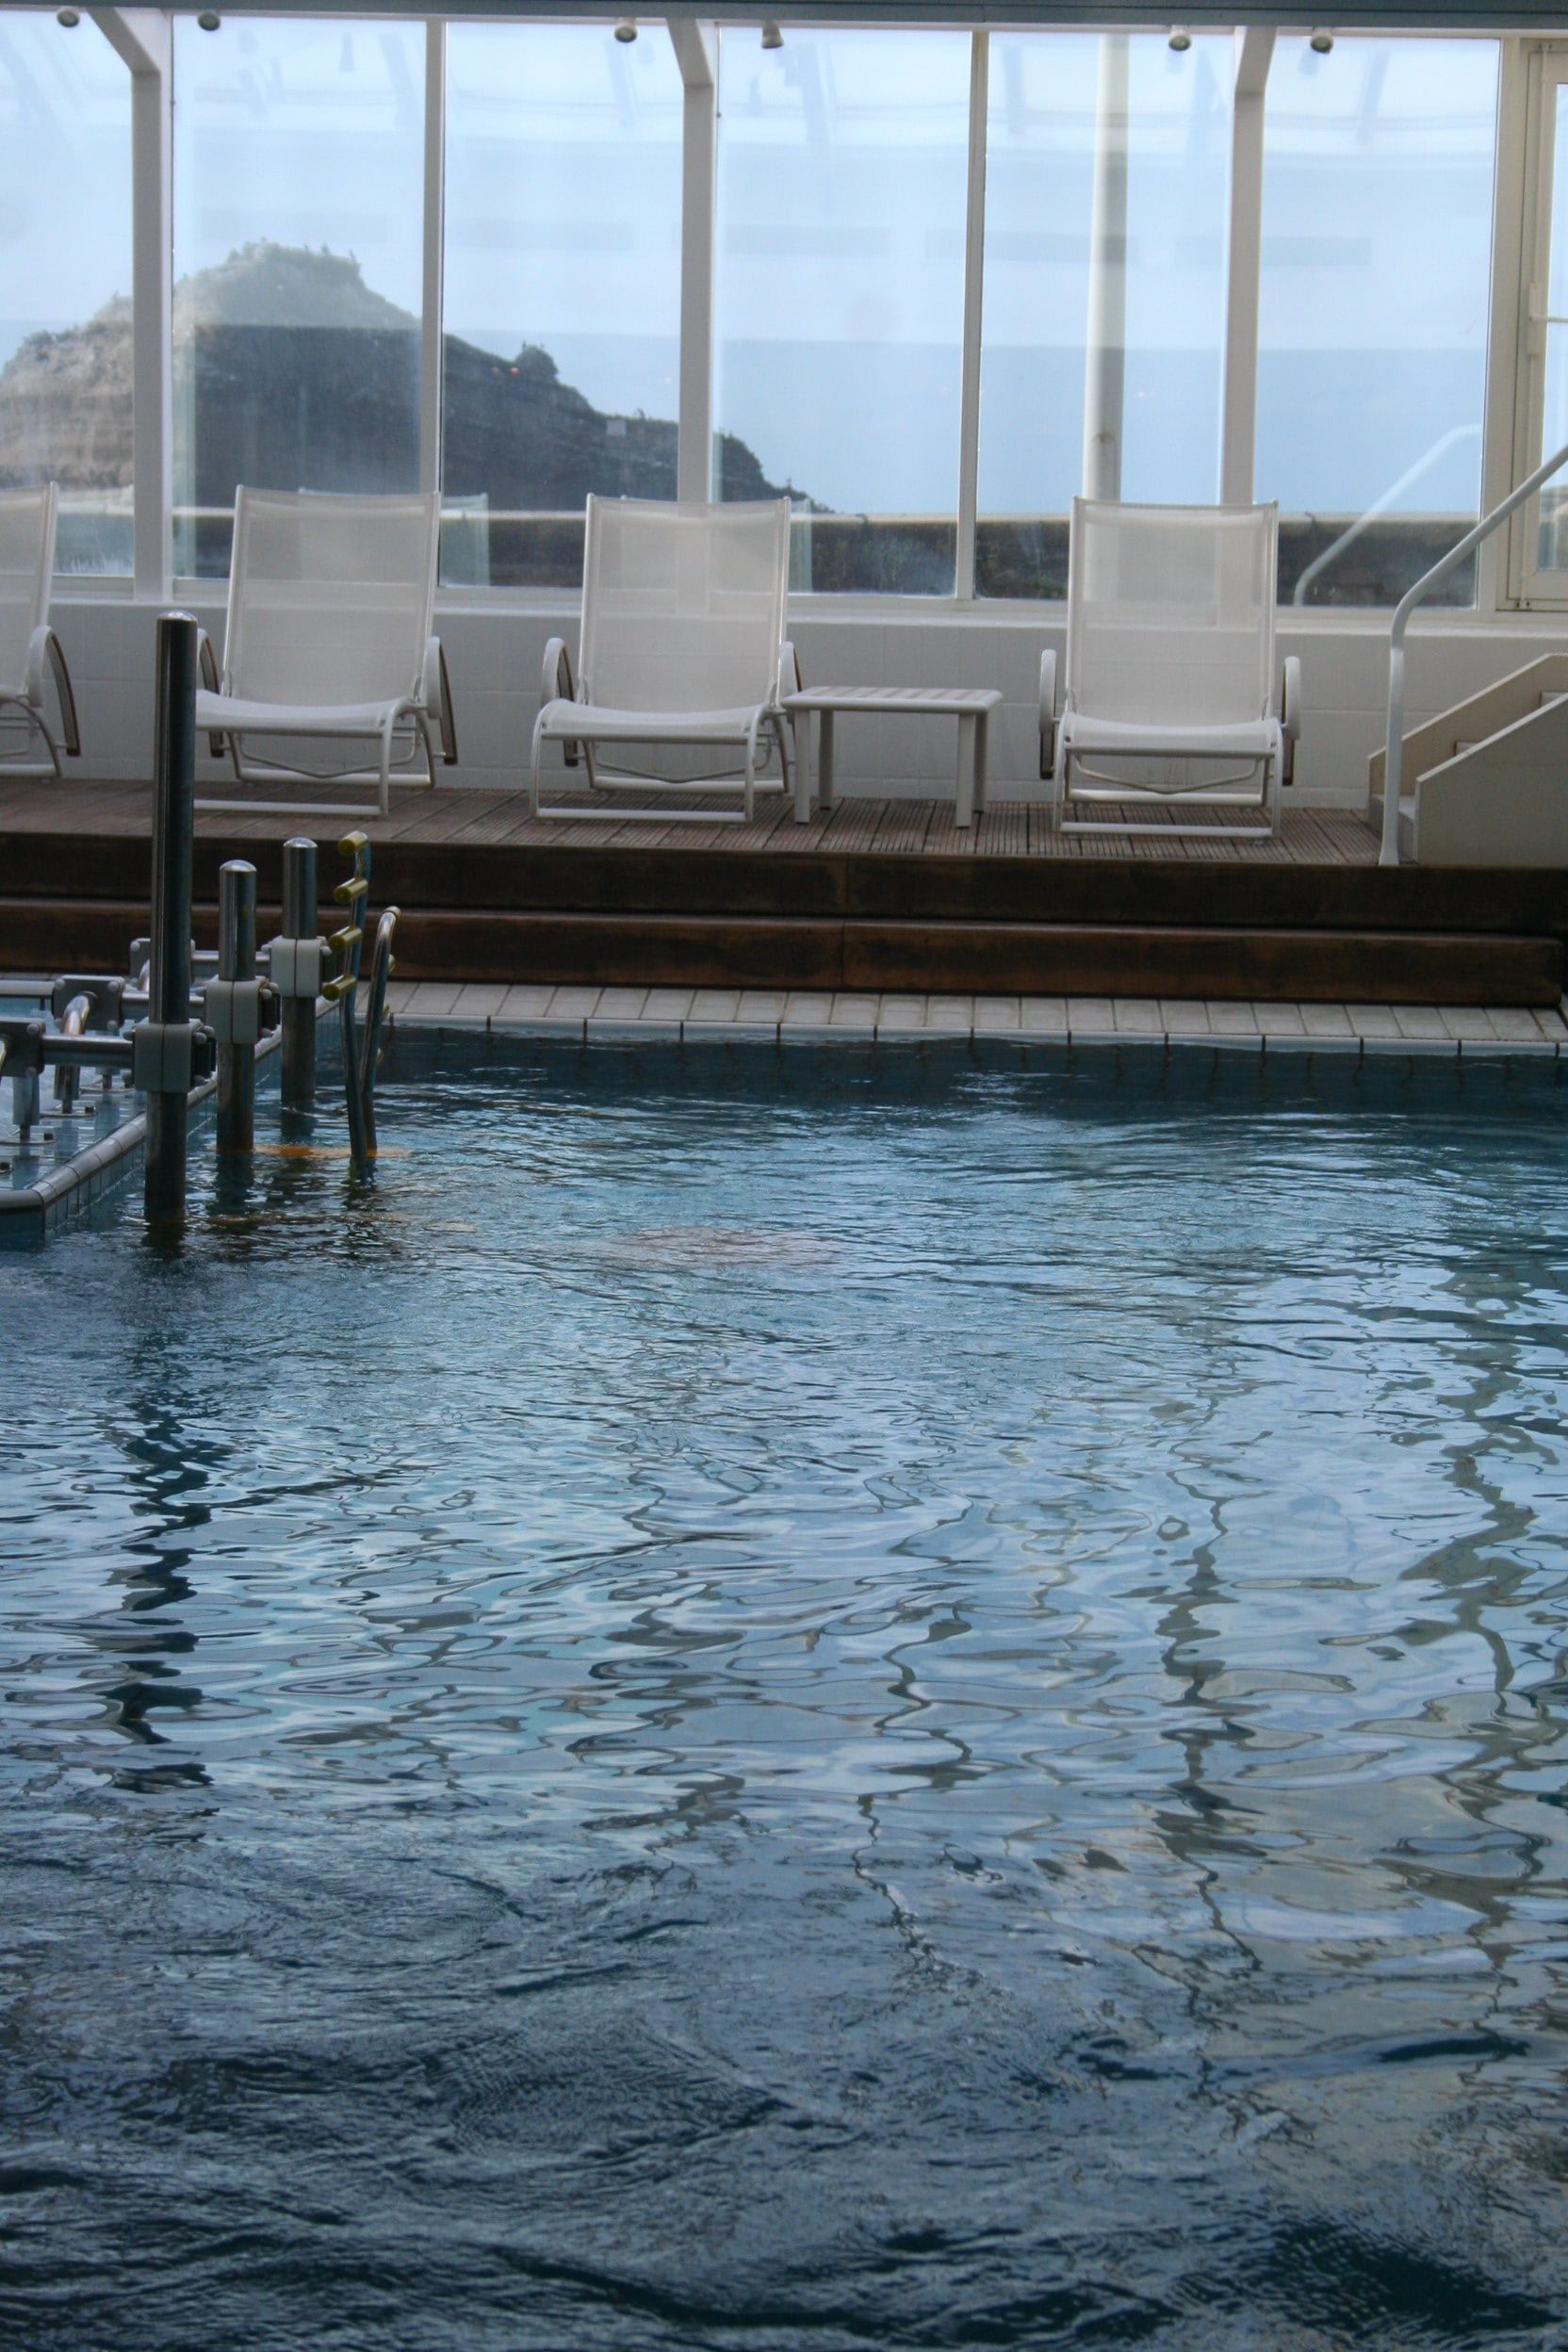 sejour-biarritz-sofitel-thalasso-Miramar-piscine-intérieure 02 ©CDT64 (1)